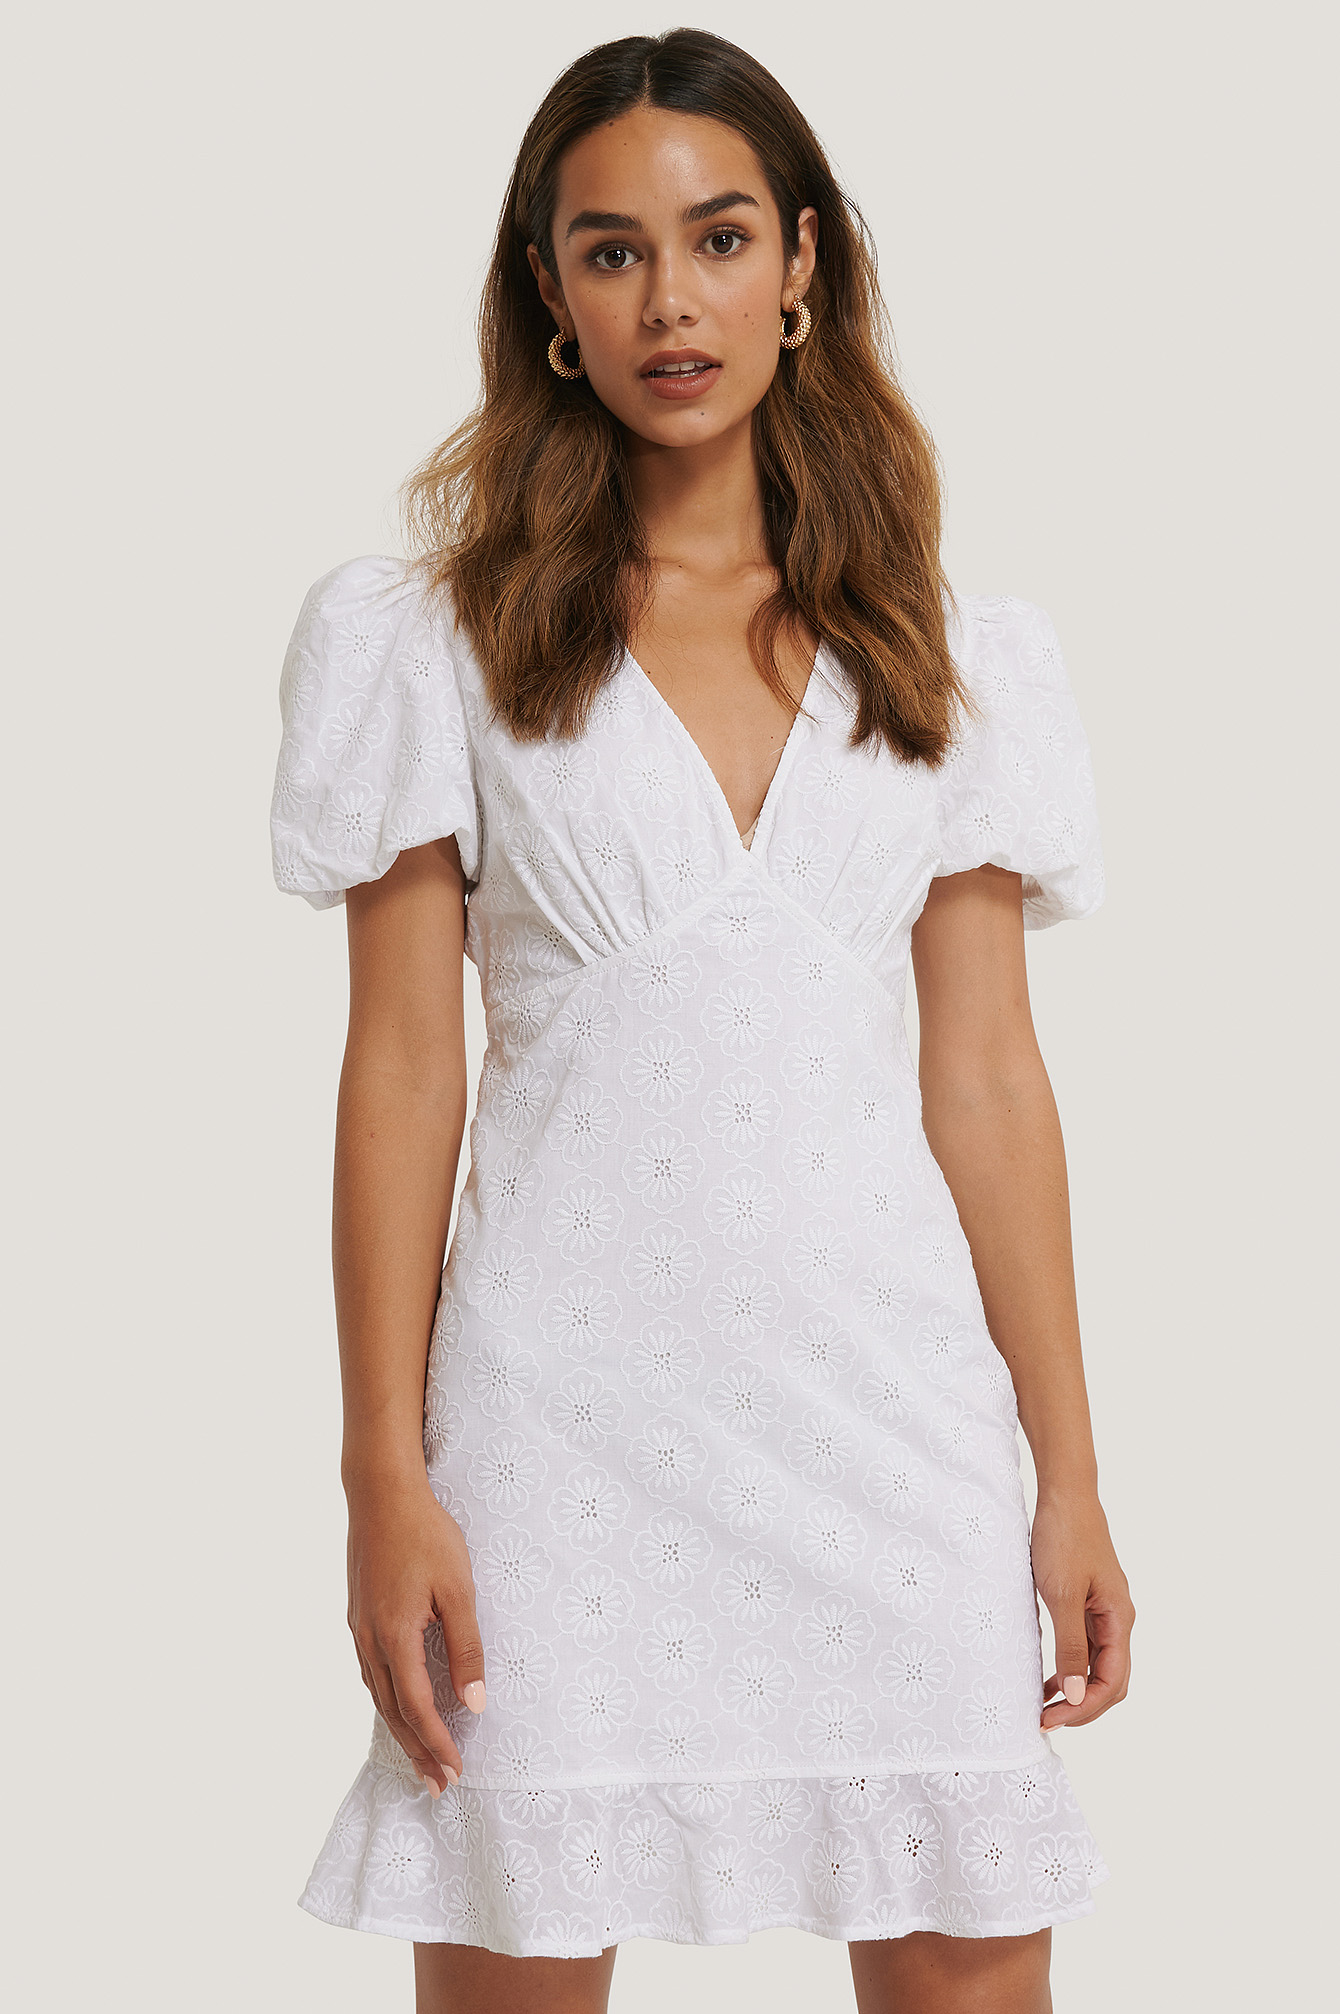 na-kd boho -  Stickerei-Blumenkleid Mit V-Ausschnitt - White